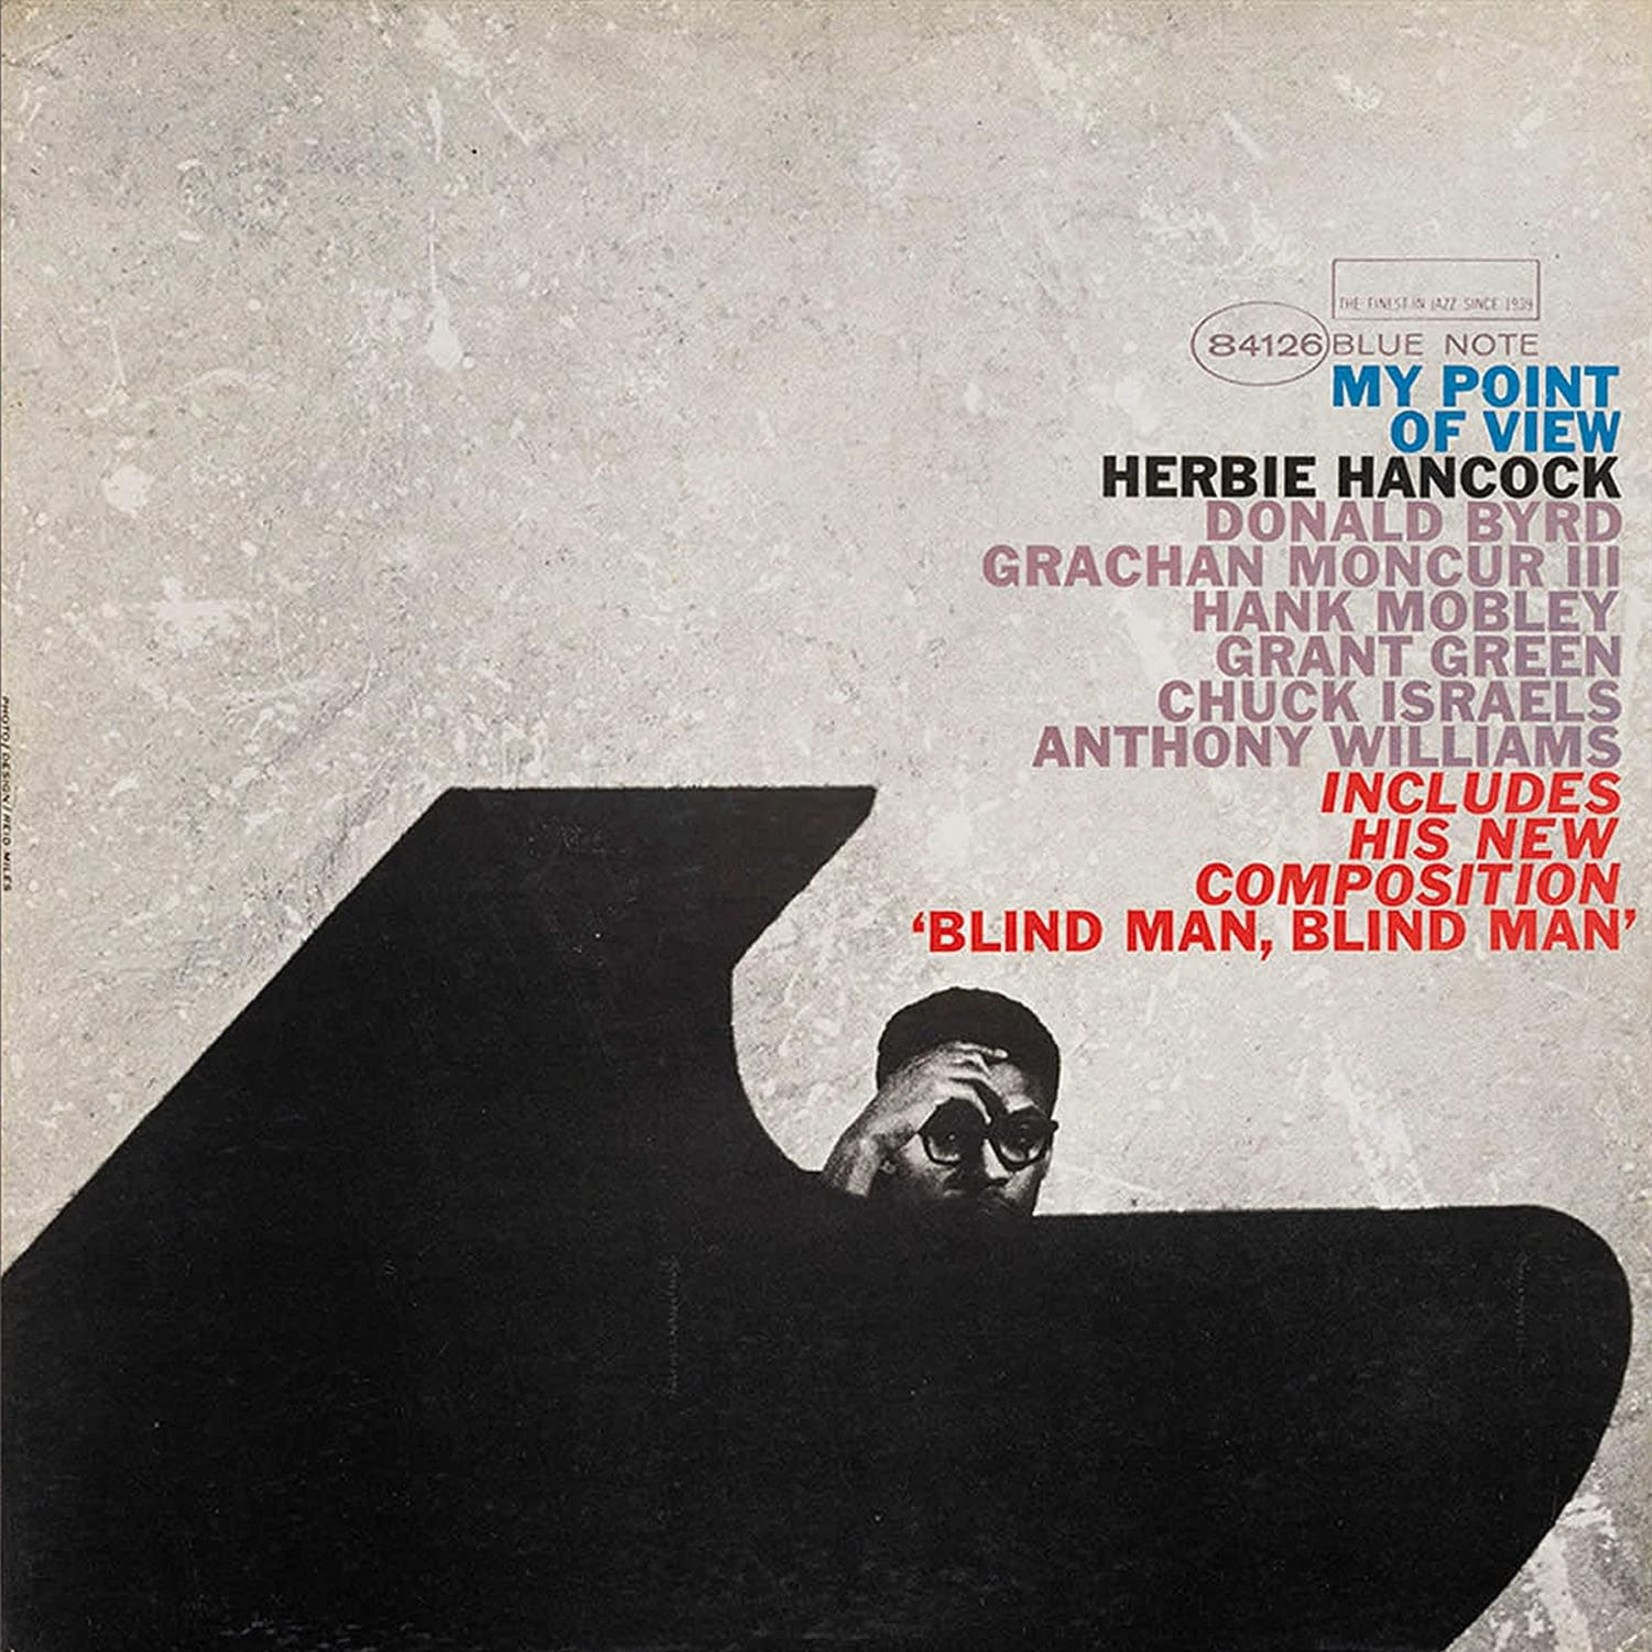 Vinyl Herbie Hancock - My Point Of View (The Poet)